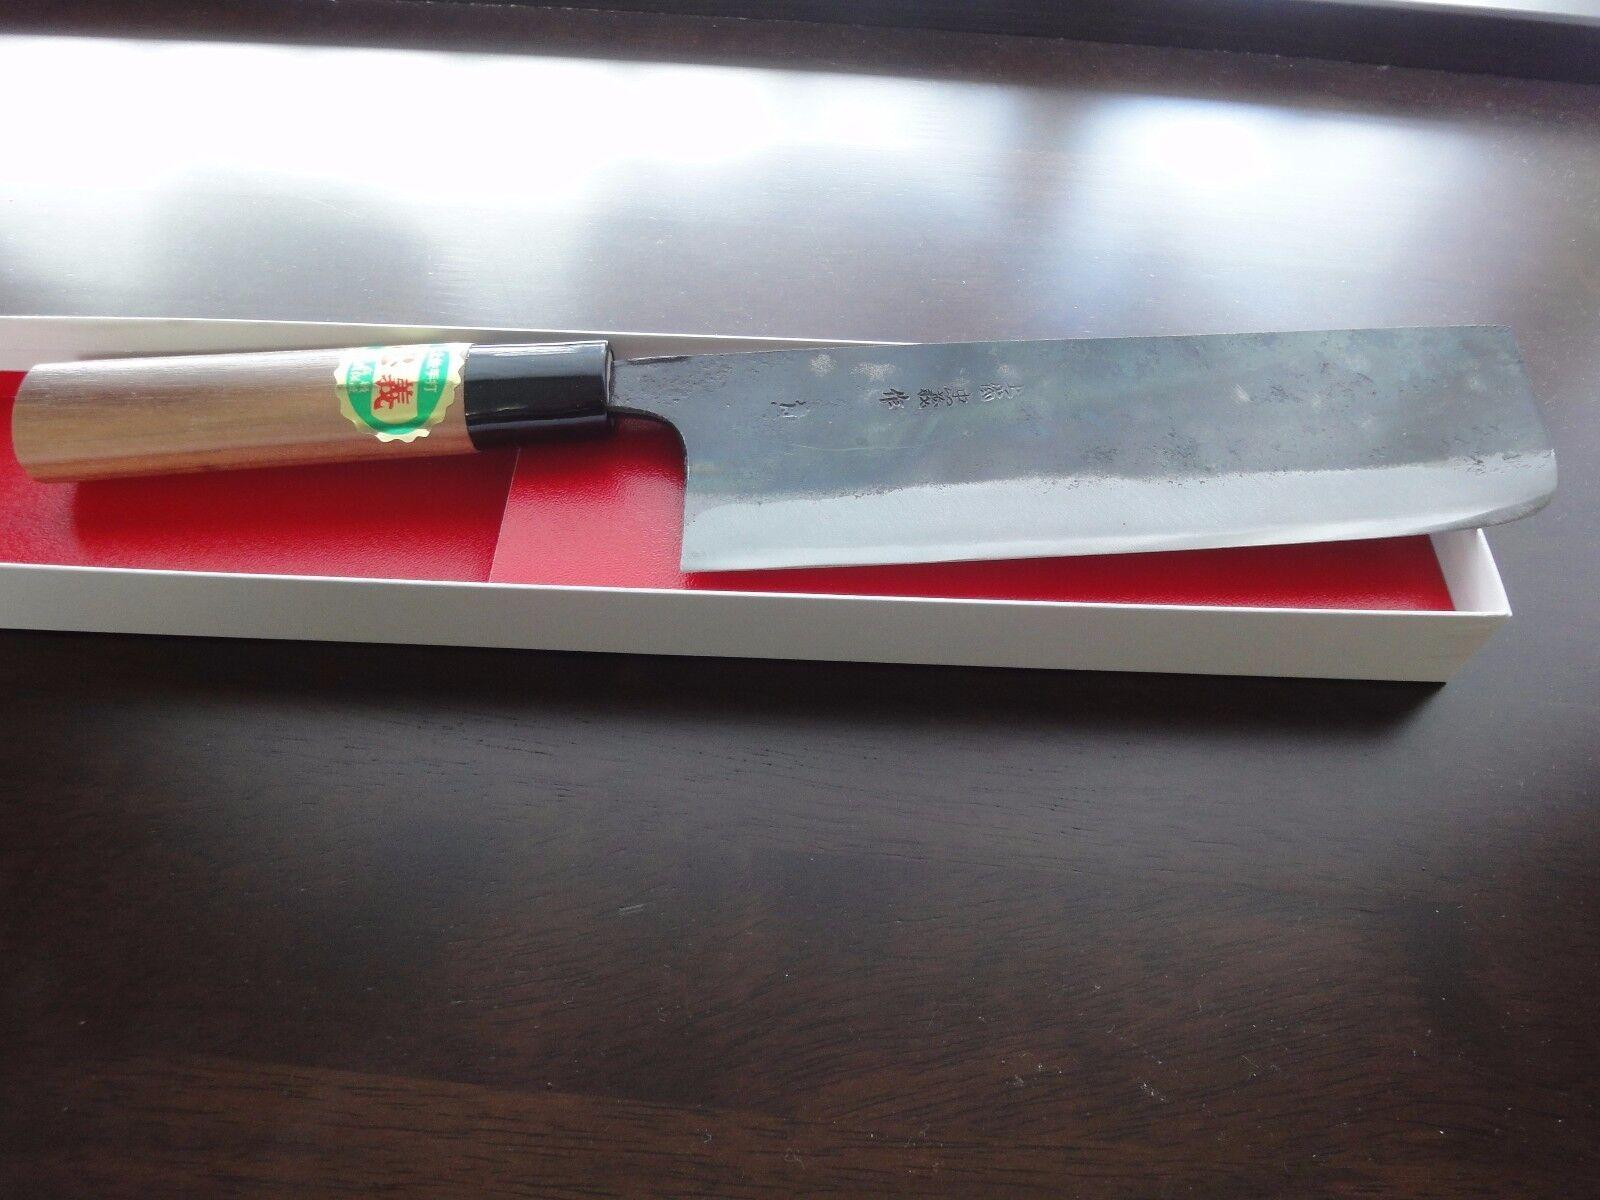 Handmade Nakiri(180mm blade) Blau Steel-1 Japanese Sushi Kitchen Chef knife